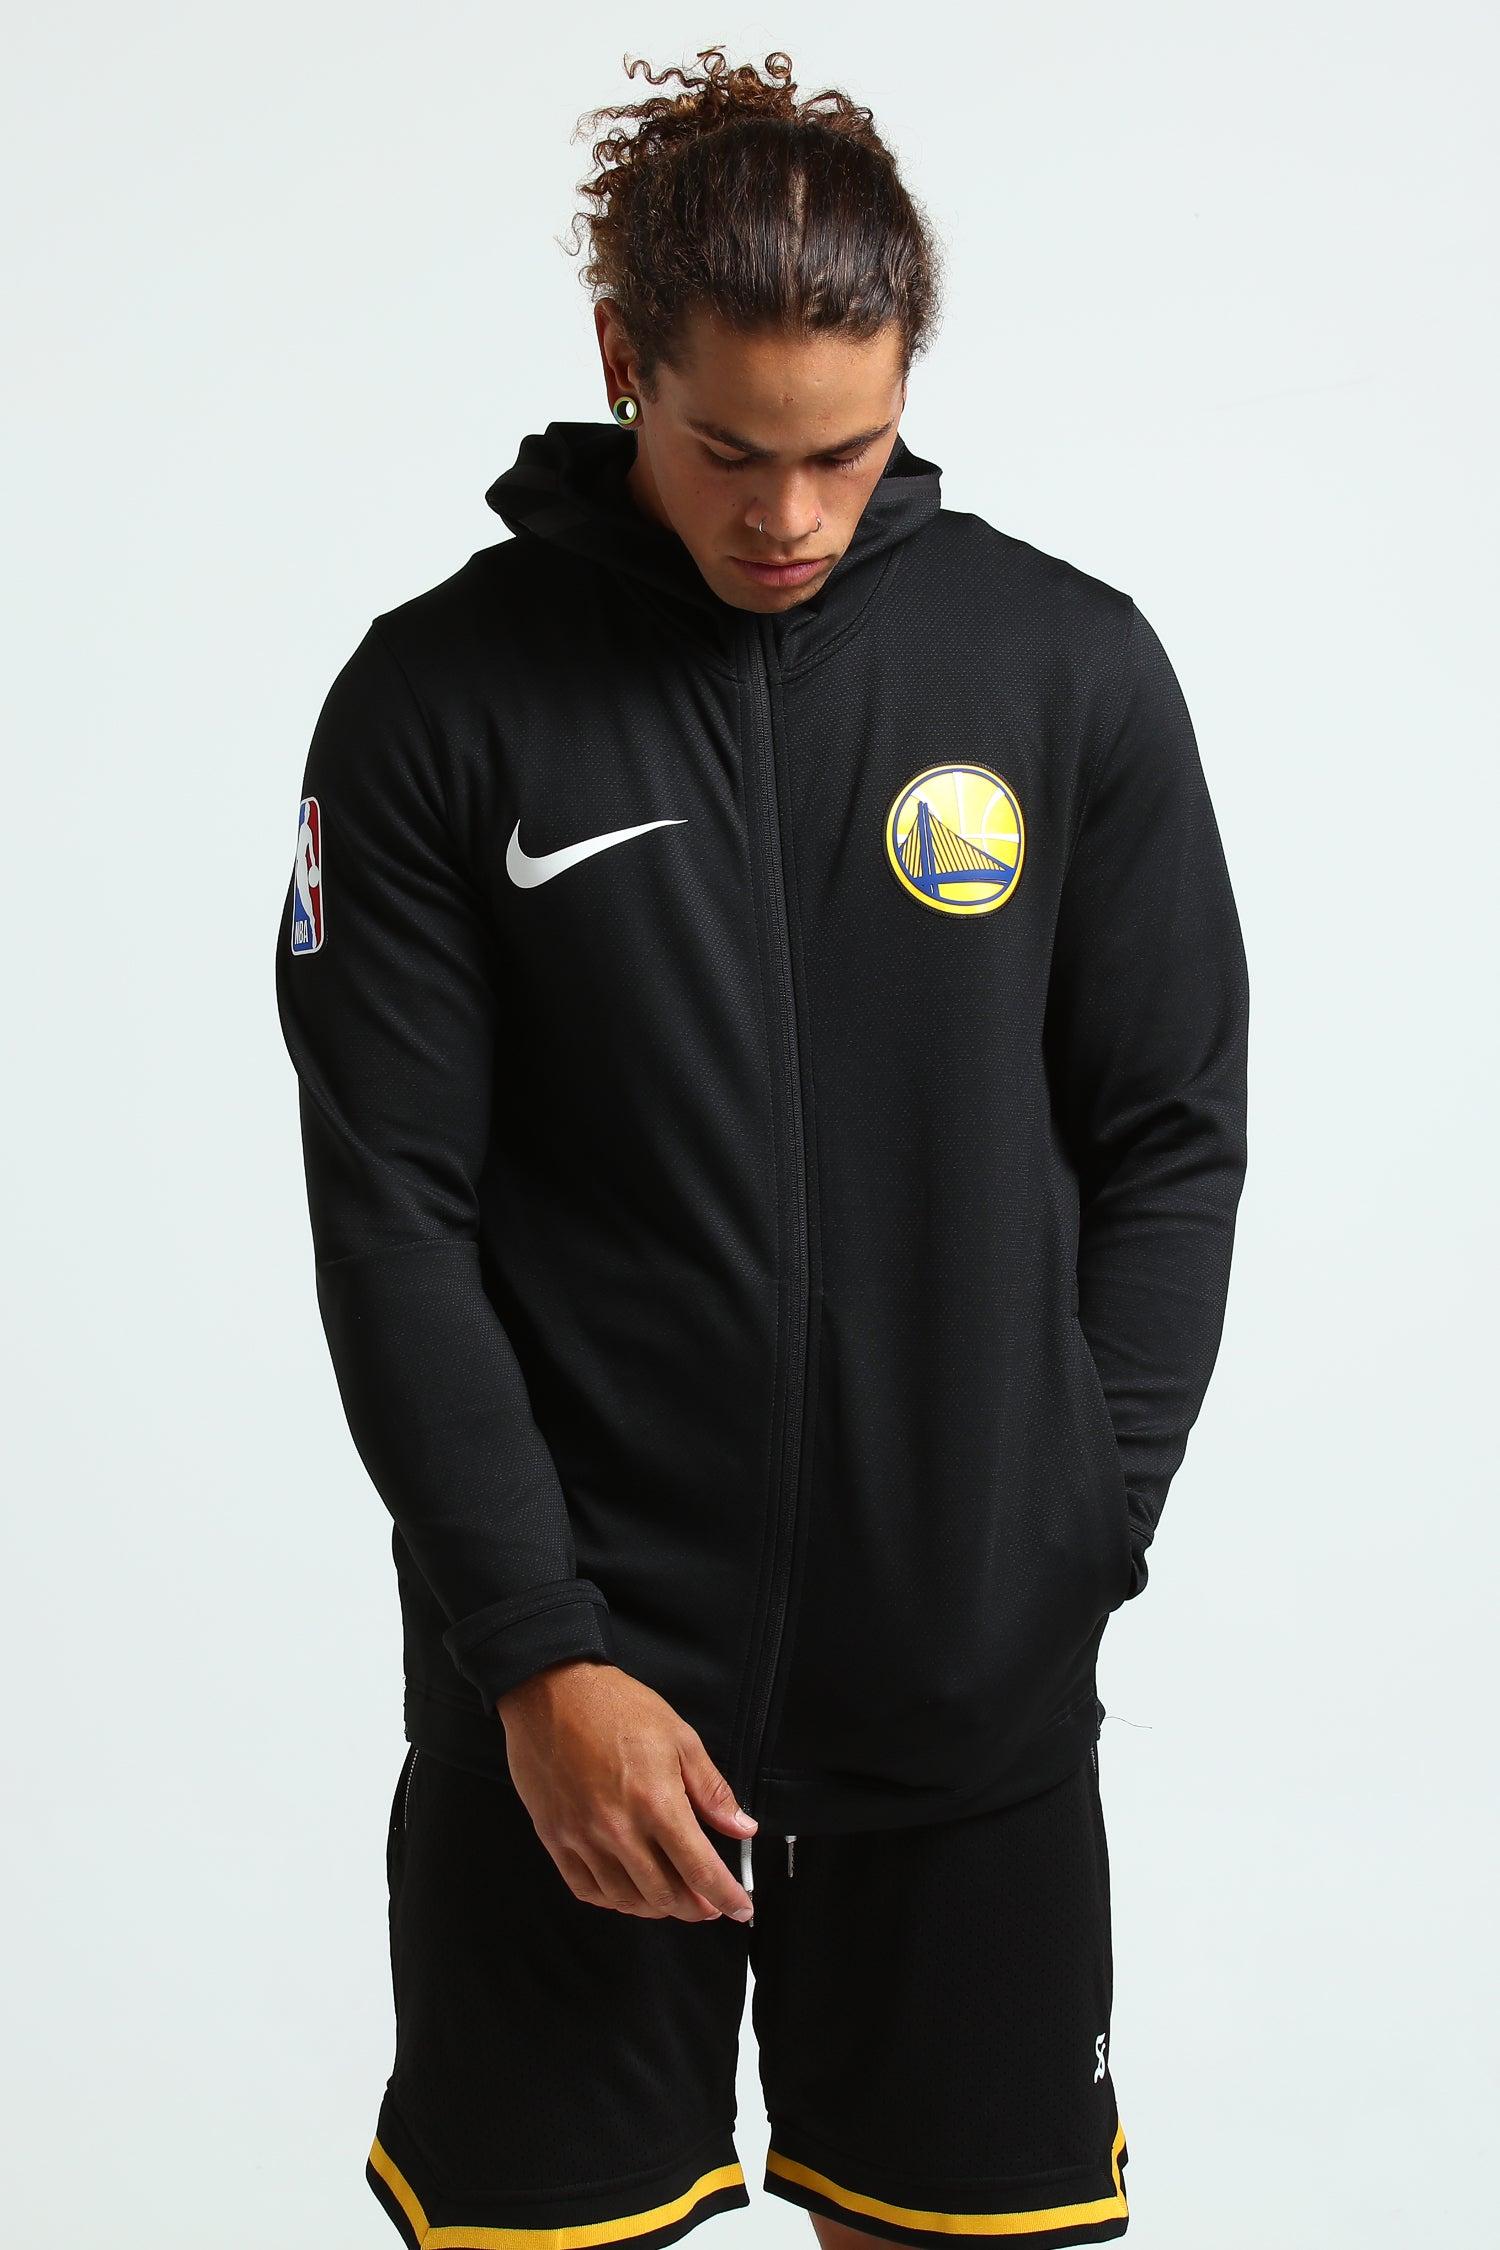 Boston Celtics Nike Mens NBA Showtime Full Zip Hoodie 2019 $100 size Extra Large